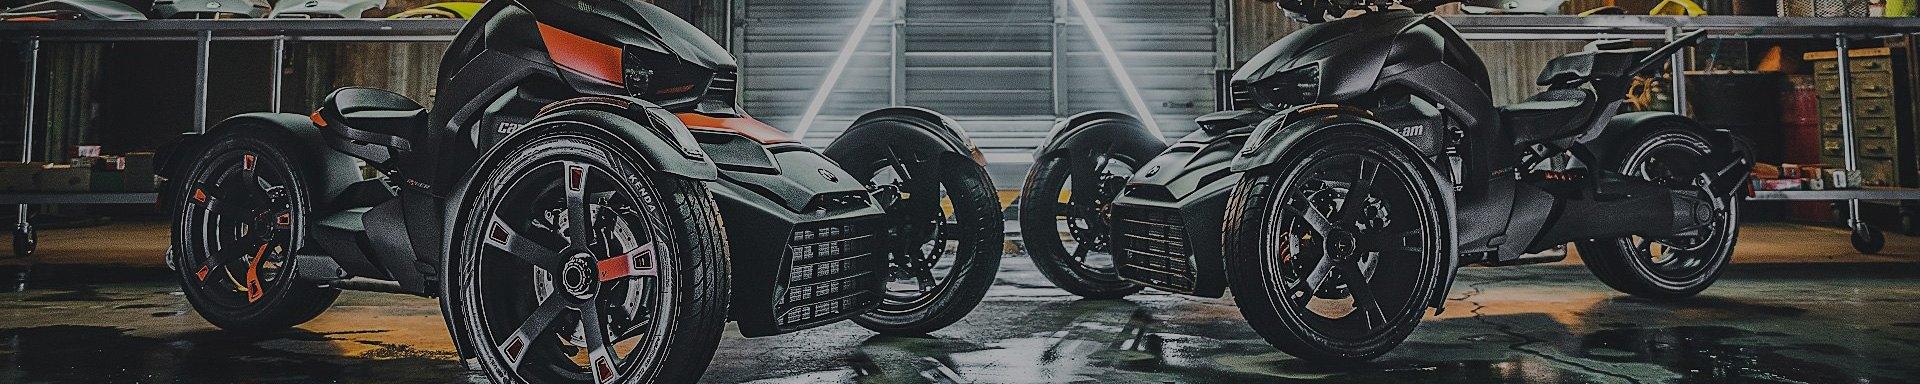 Motorcycle Parts & Accessories | Sport Bike, Cruiser, Dirt